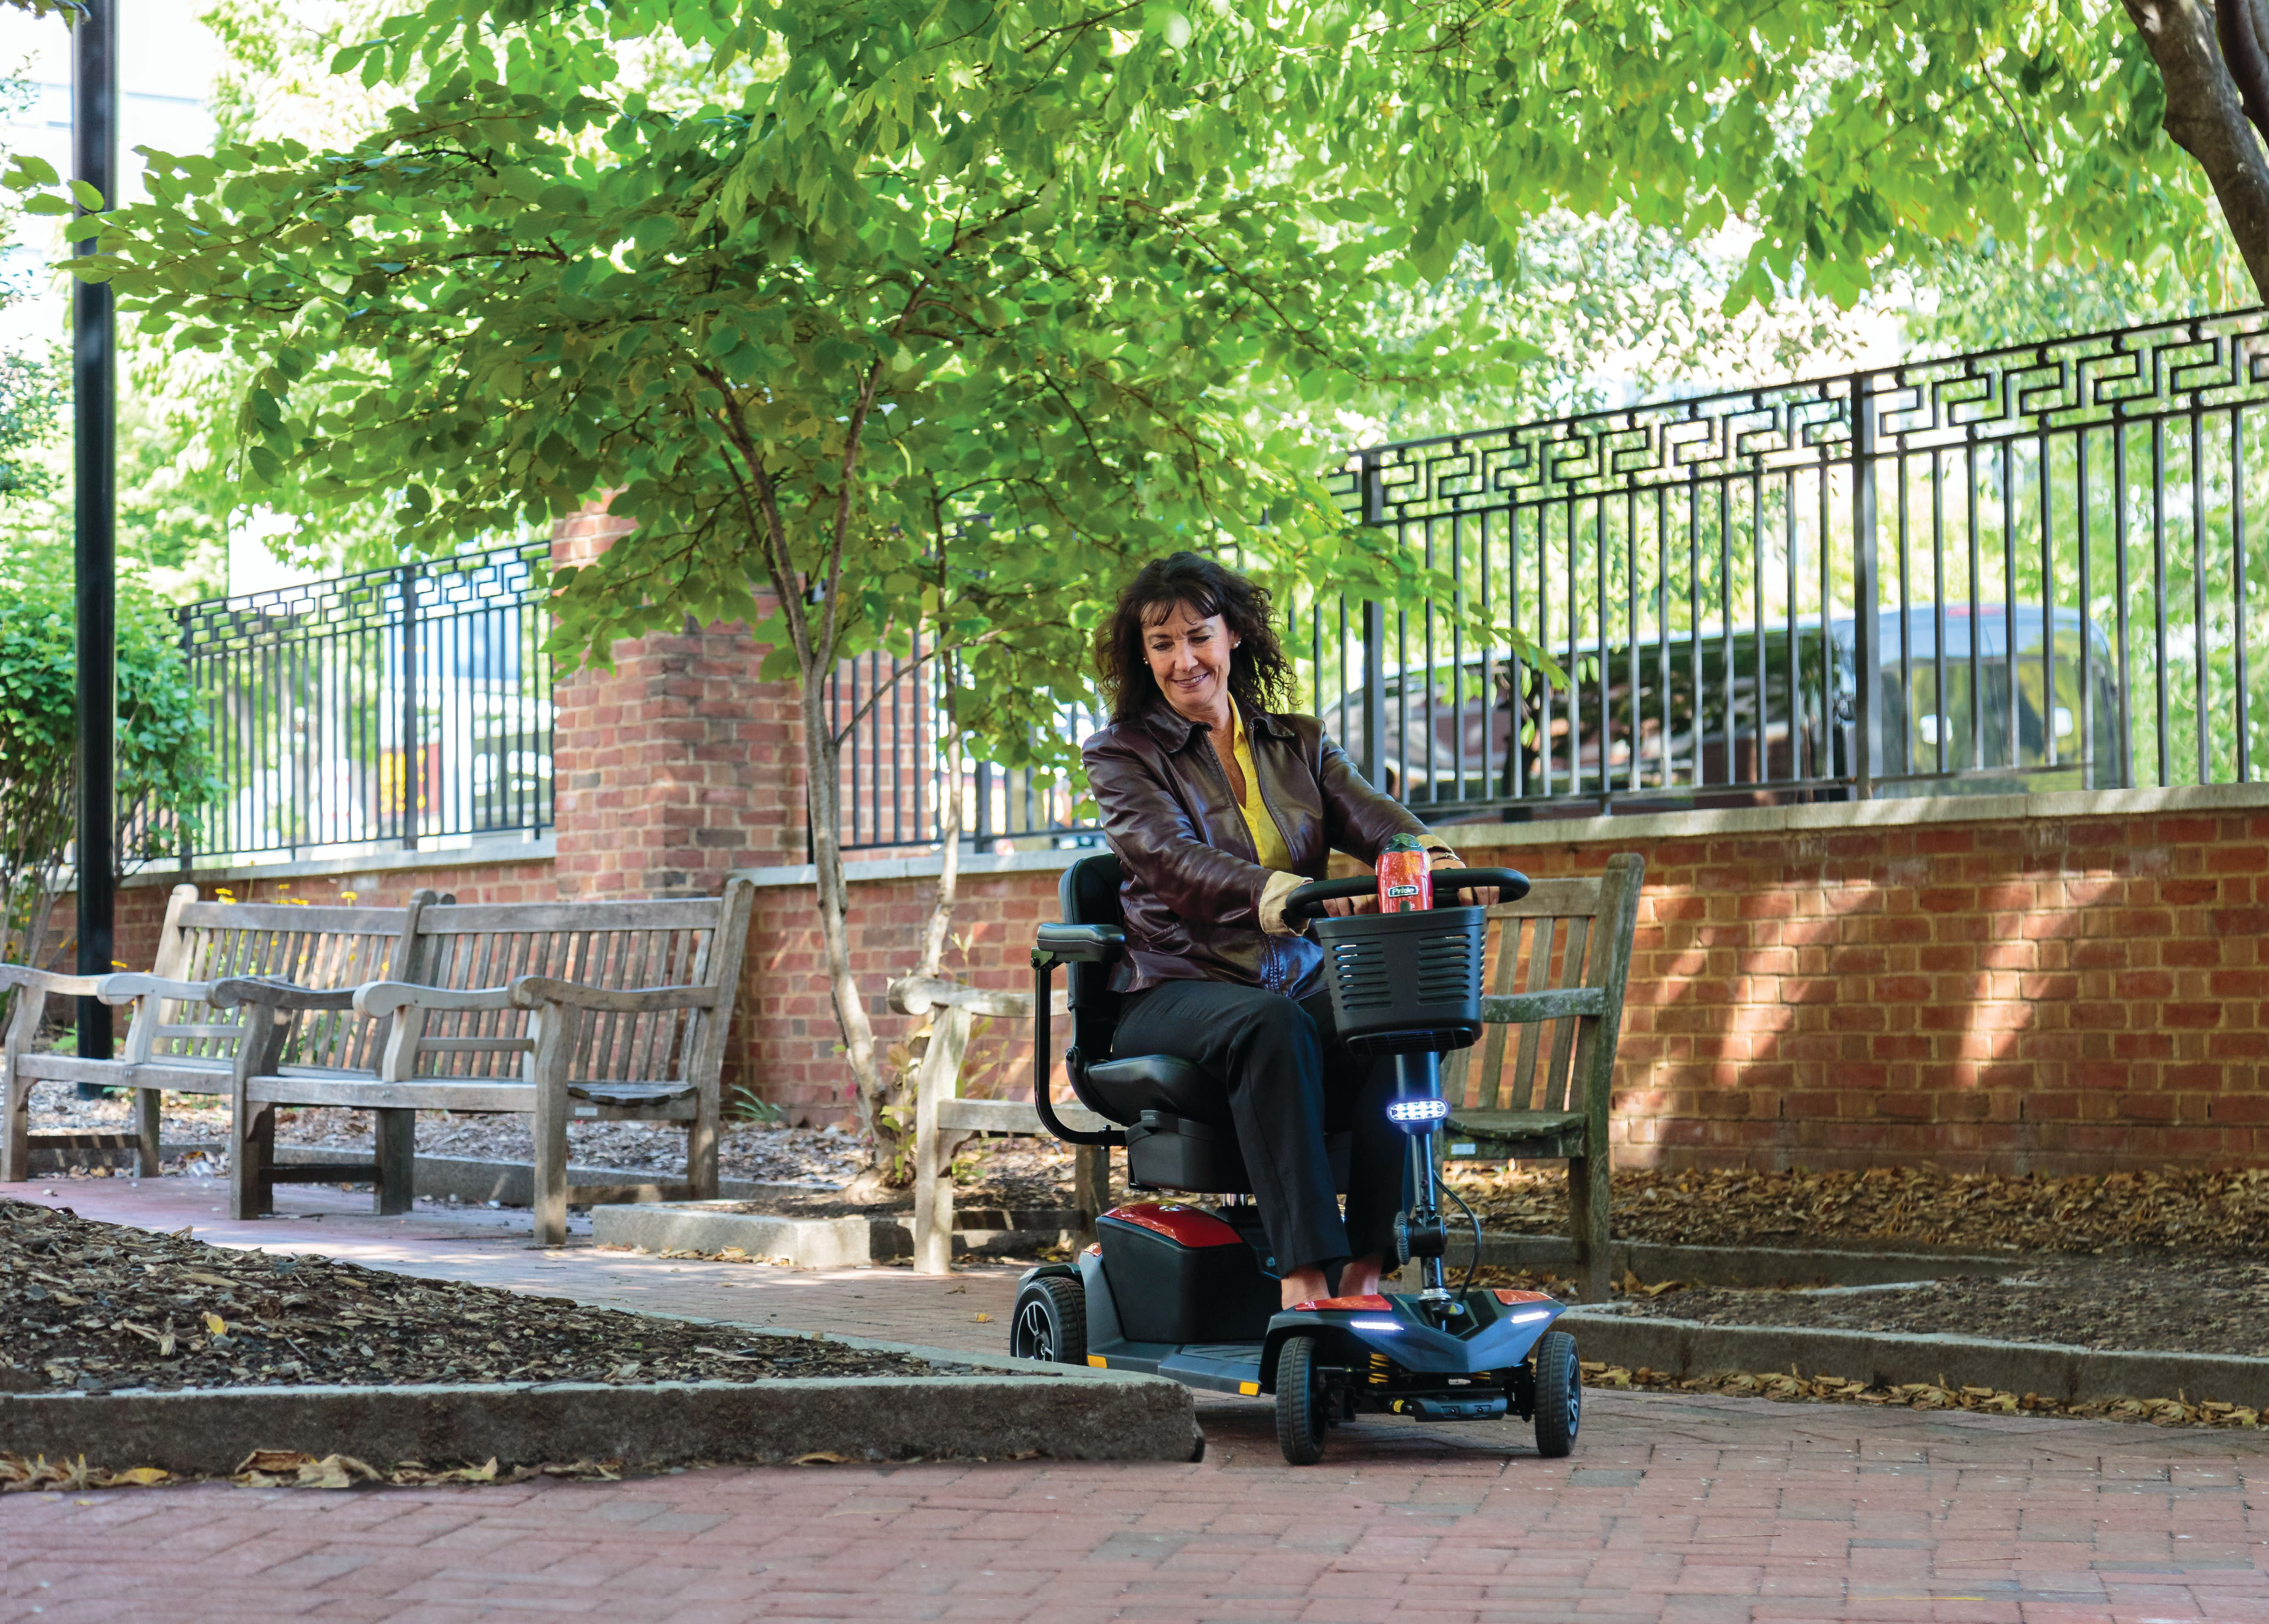 Frau fährt auf Elektromobil